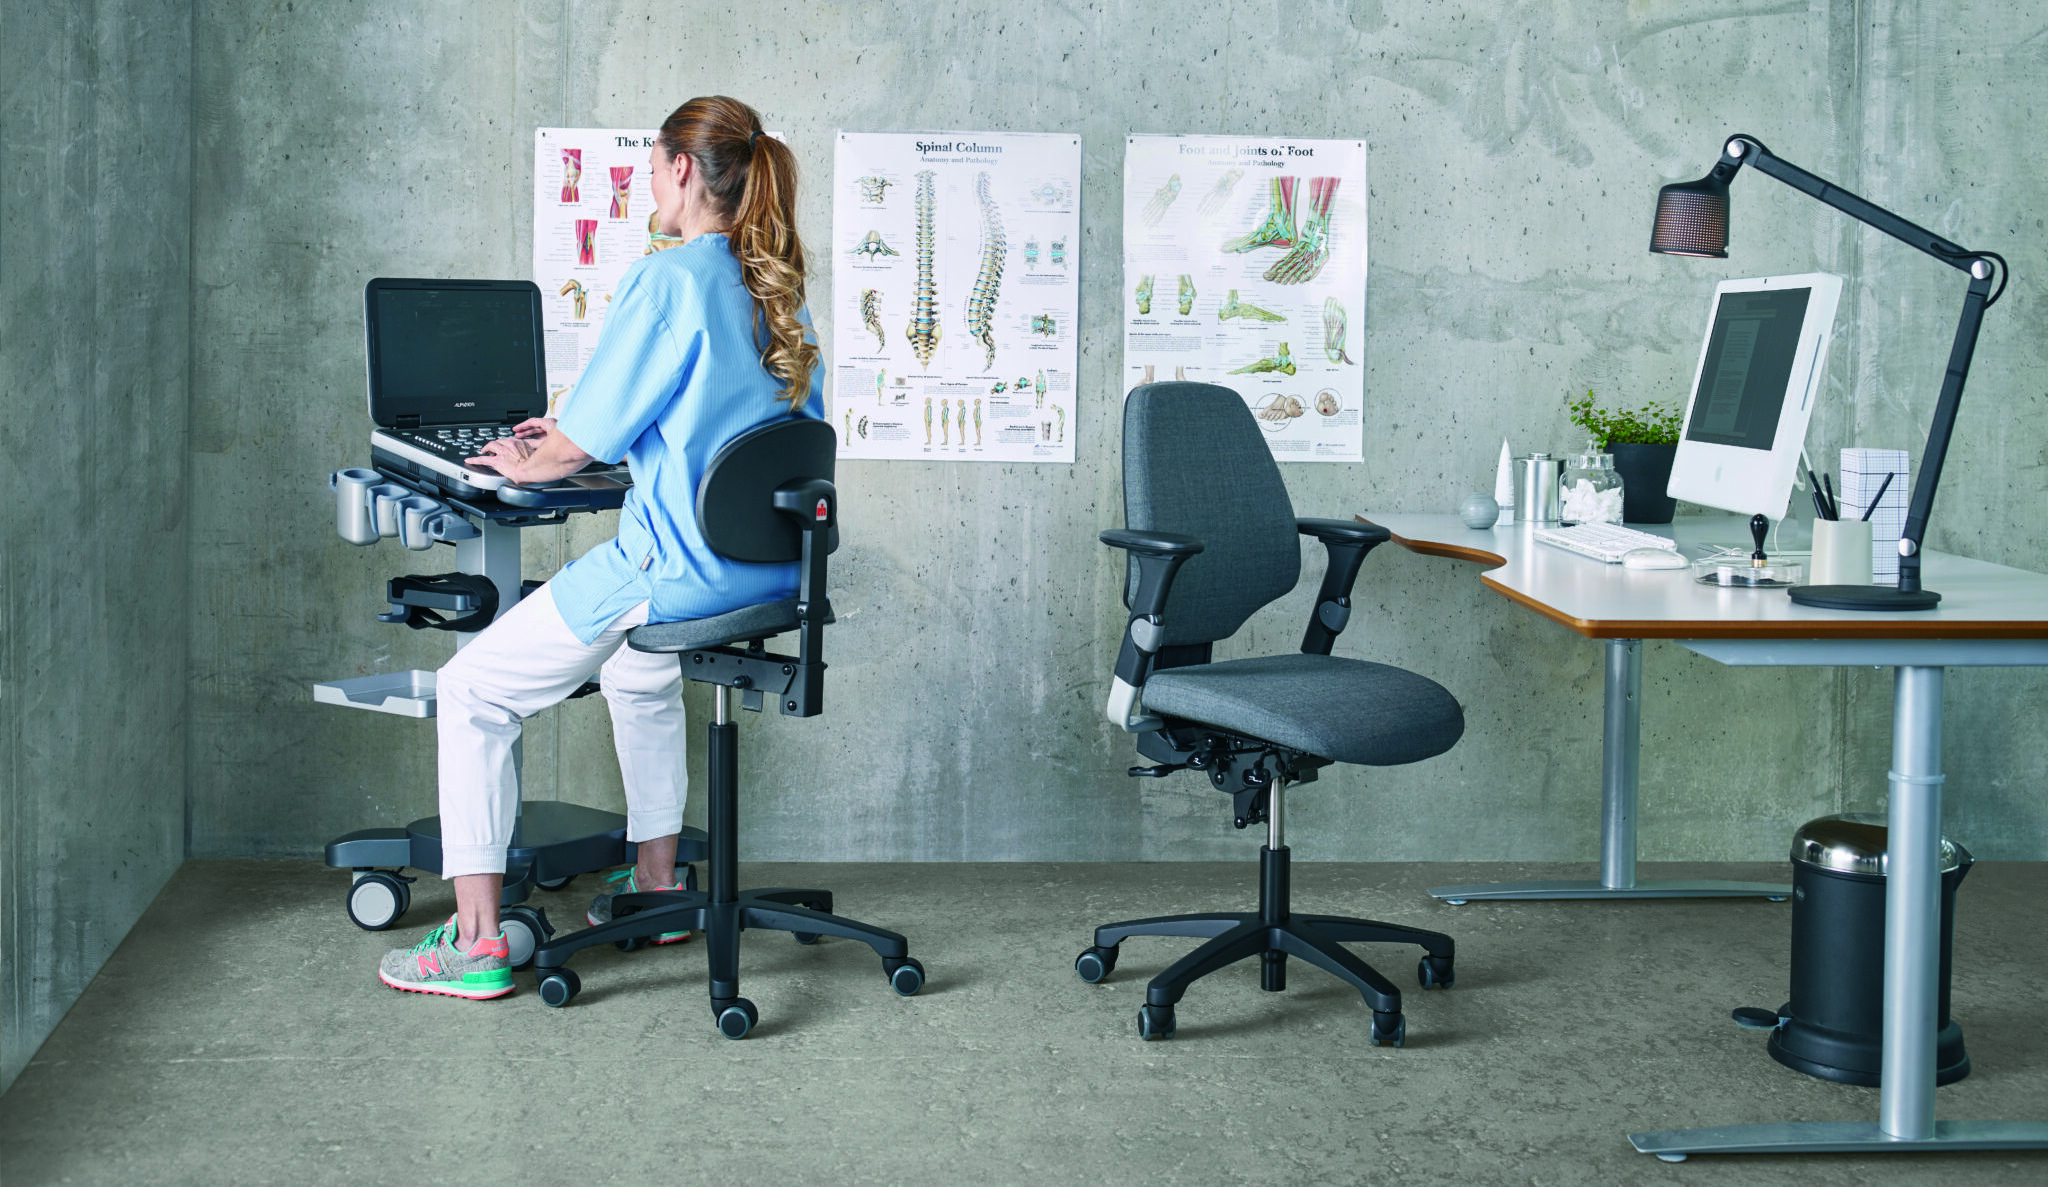 HAG kantoormeubilair ergonomie werkplek Den Haag Heering Office